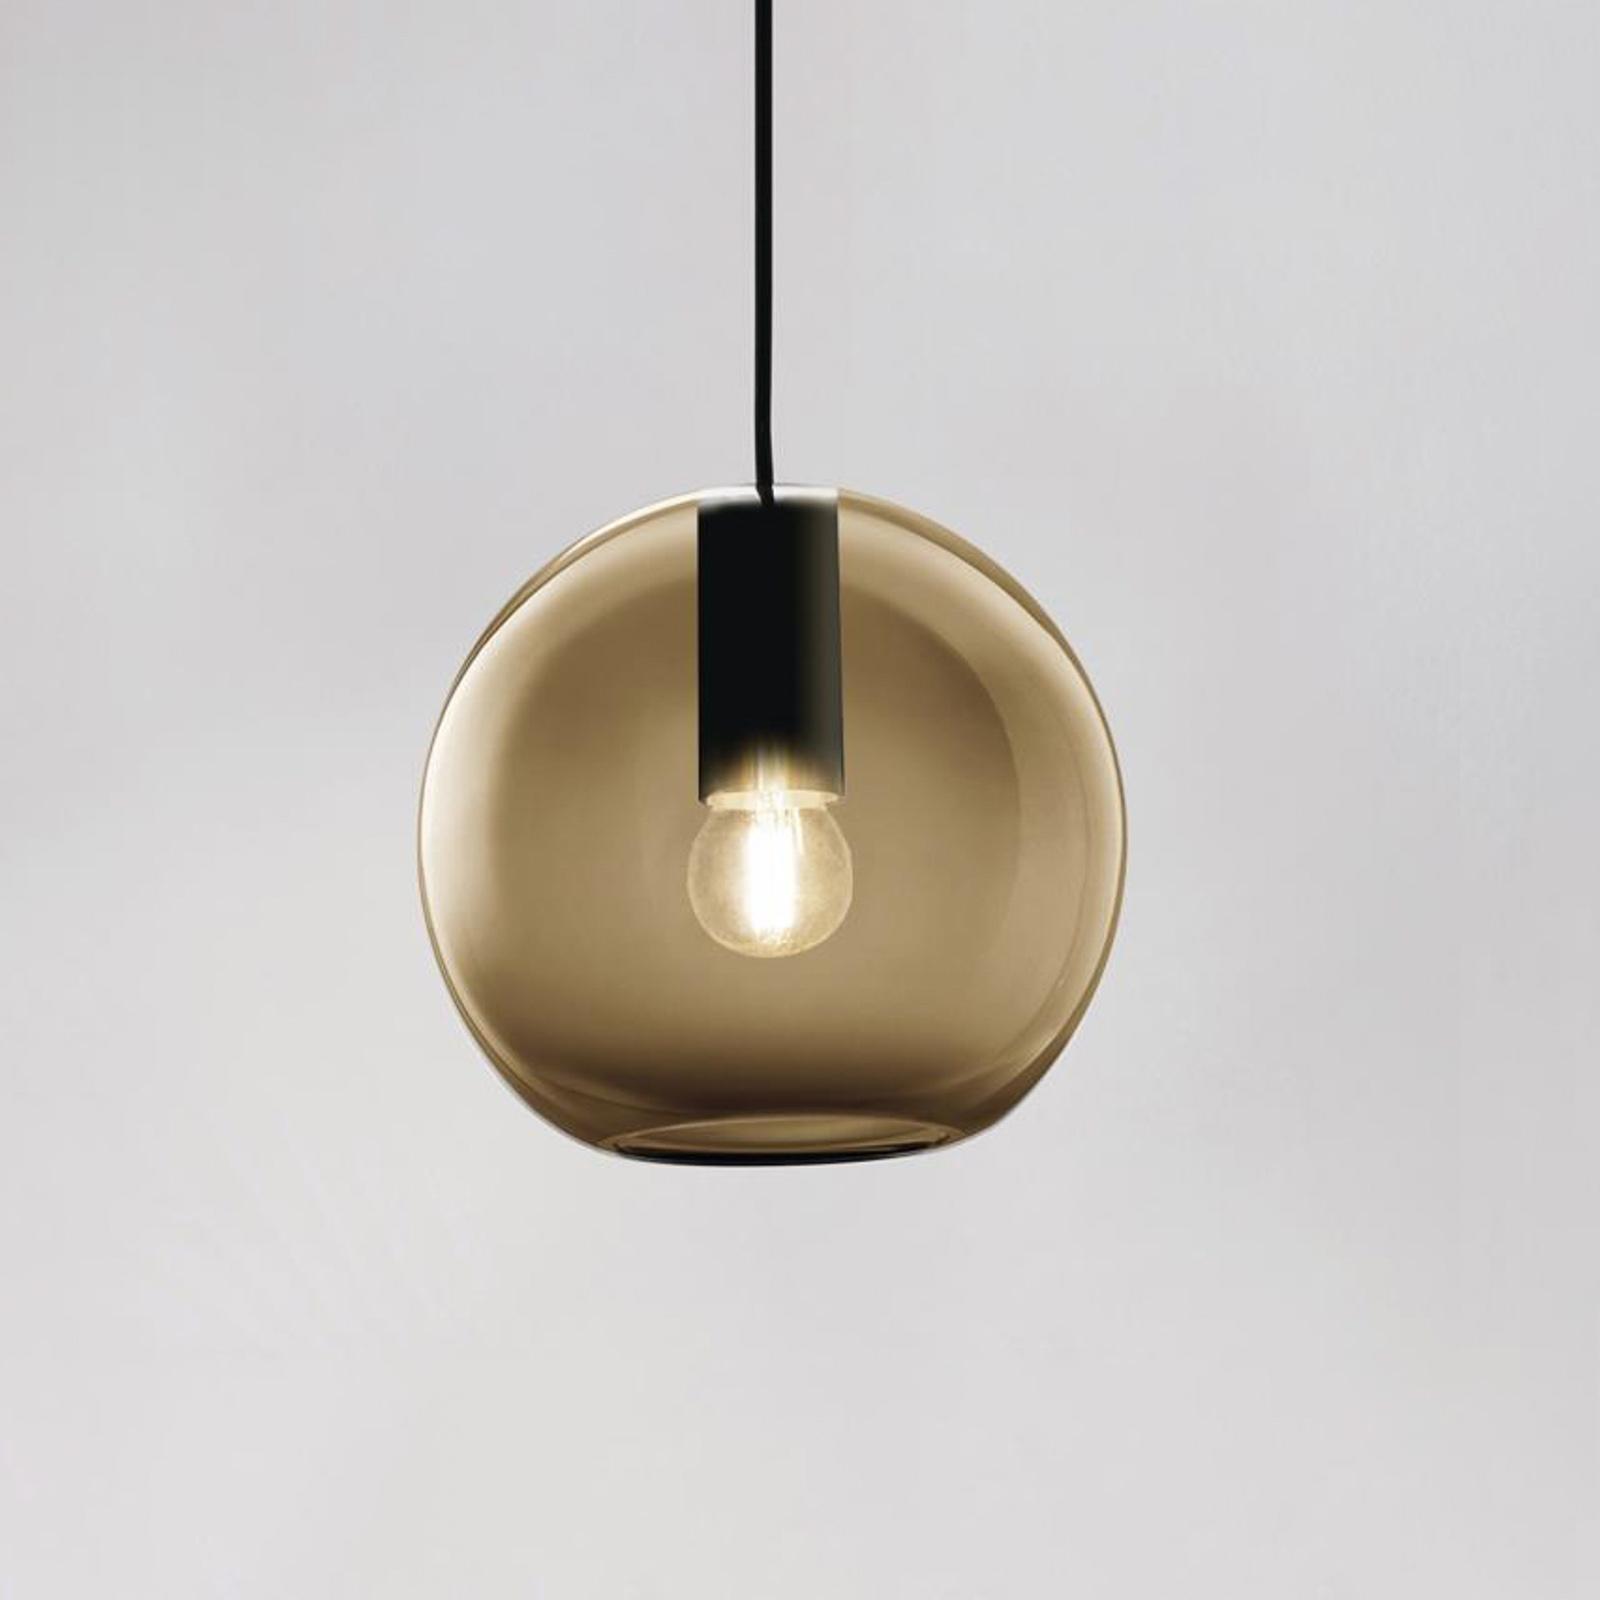 LOUM Loon Mini hængelampe, brunt glas, sort